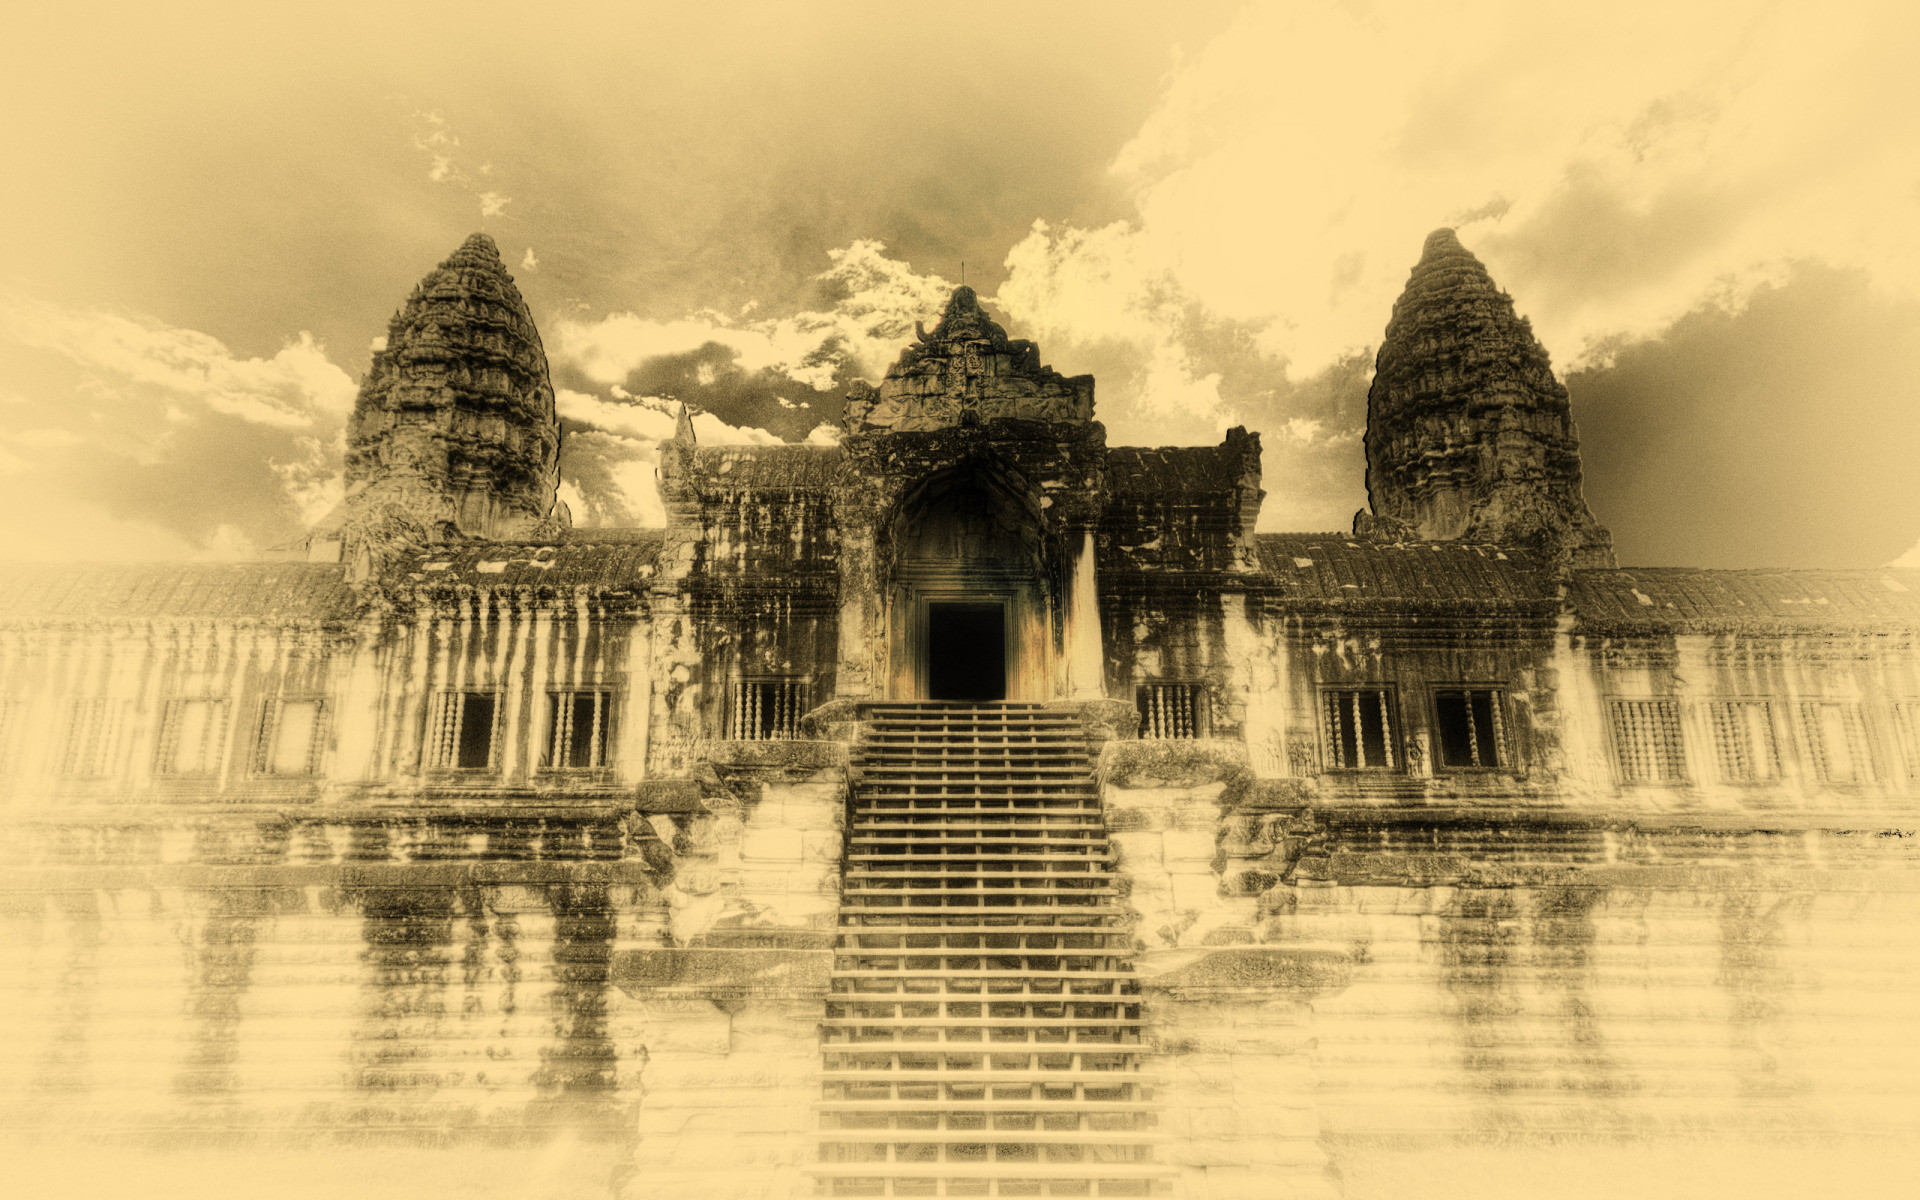 Supreme Wallpaper Hd Angkor Wat Wallpaper Hd 60 Images